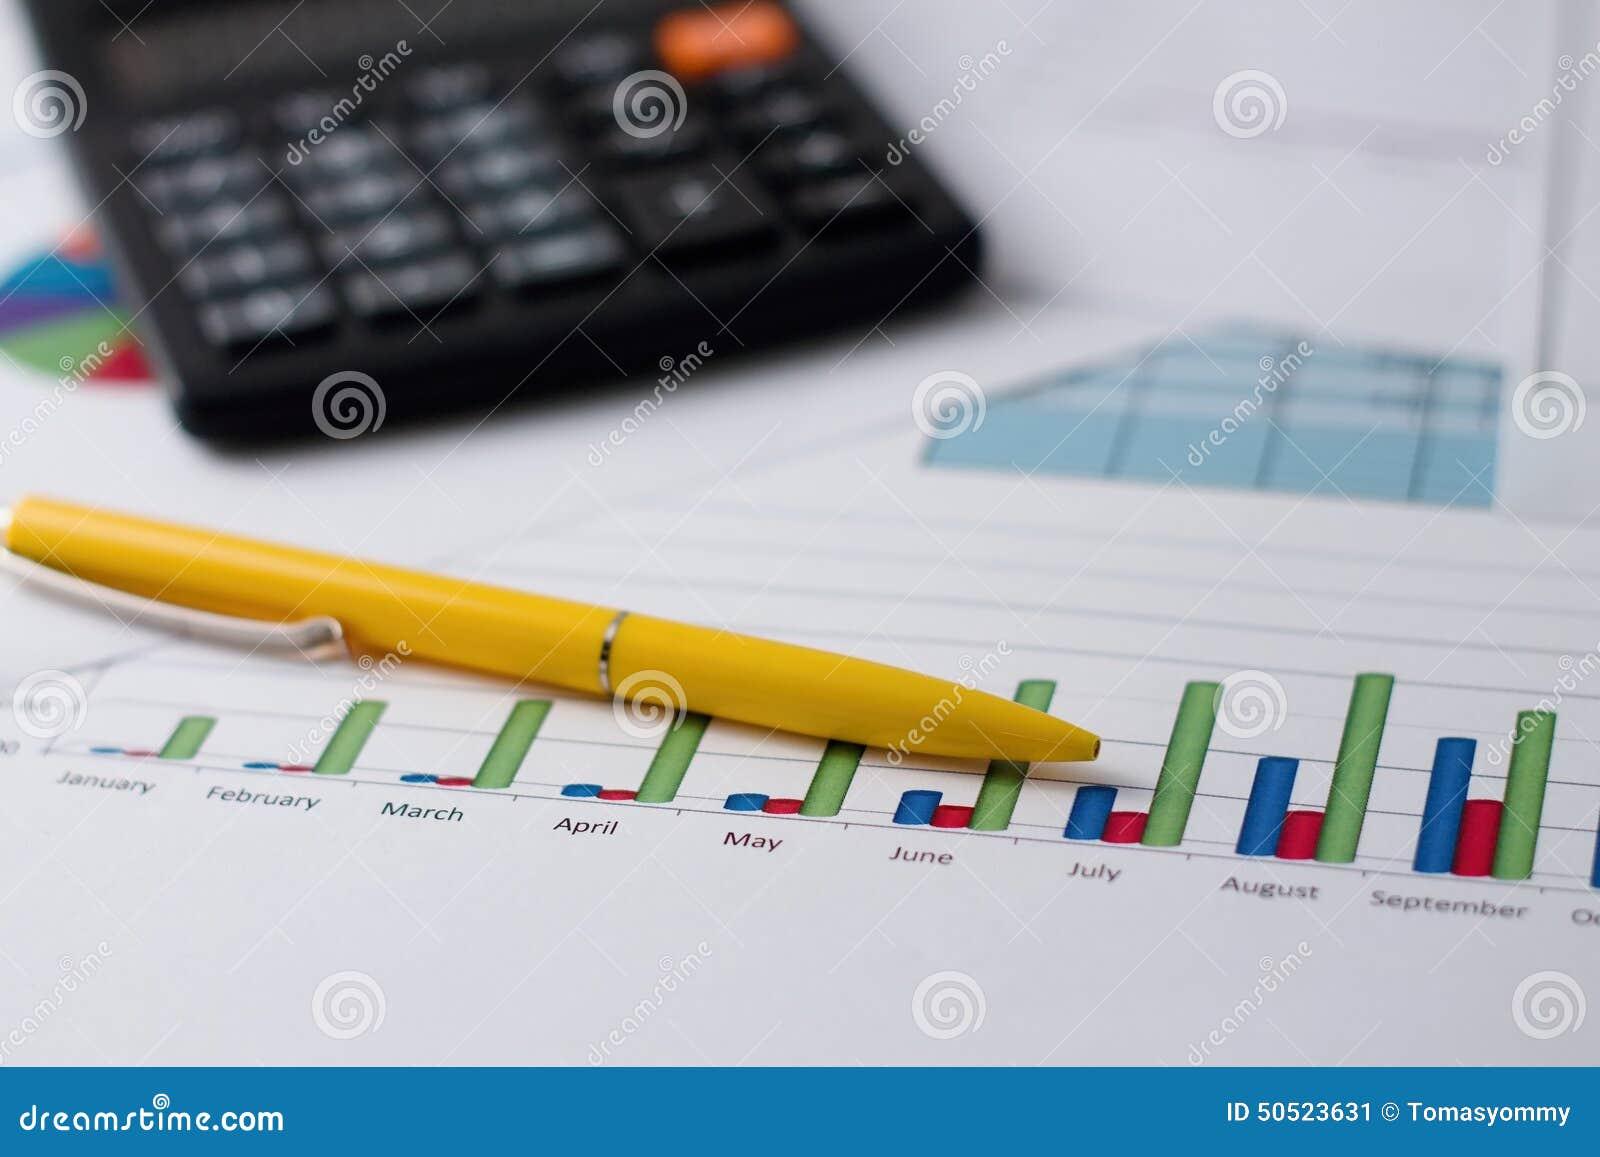 Bar chart on paper sheet pen and calculator stock image image of bar chart on paper sheet pen and calculator ccuart Image collections